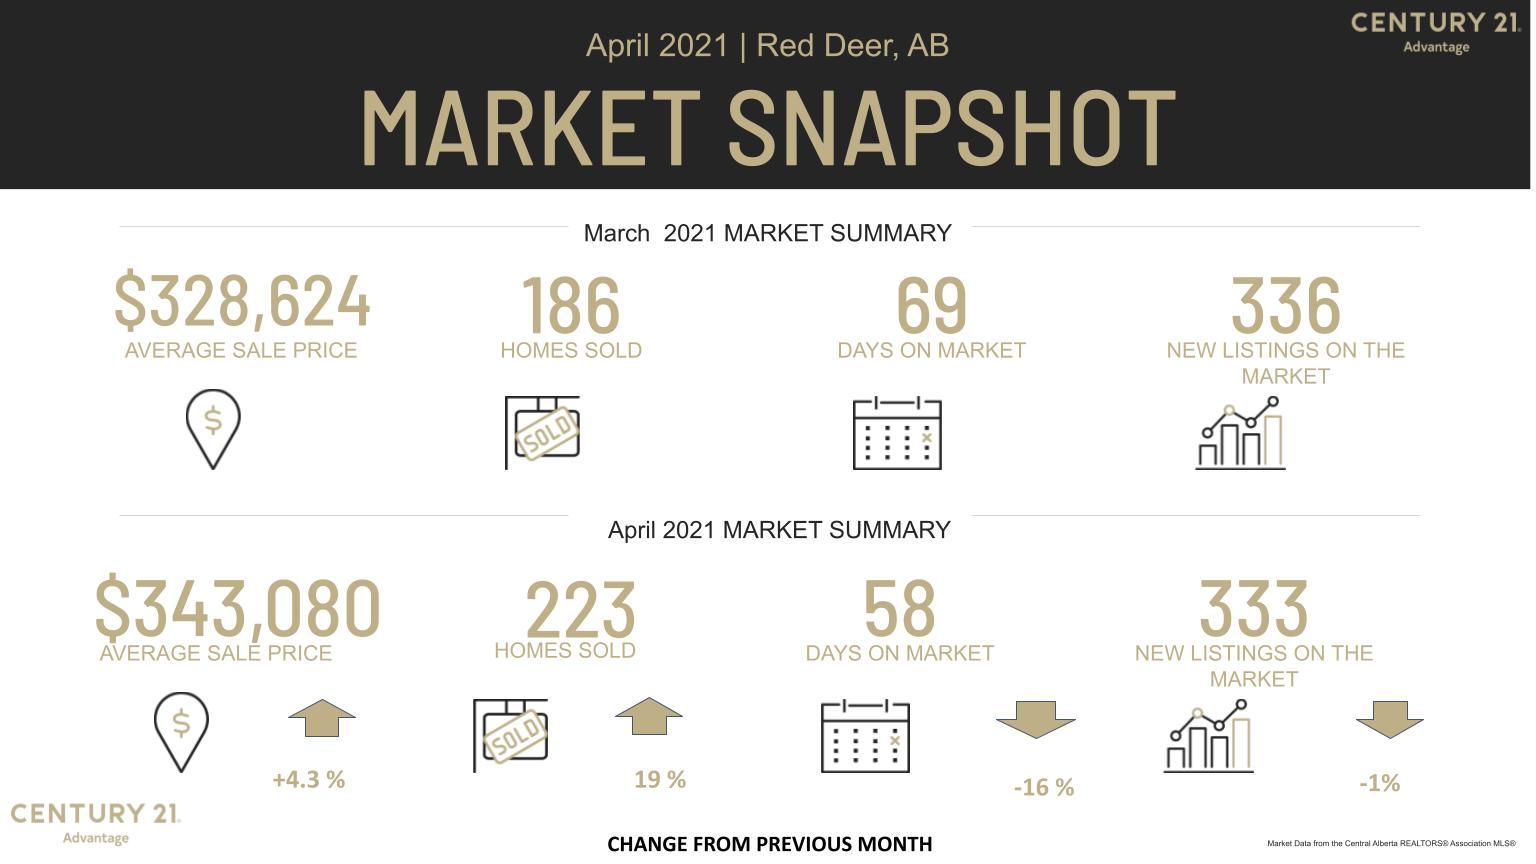 Red Deer Real Estate Market March 2021 versus April 2021 MLS Stats from Century 21 Advantage